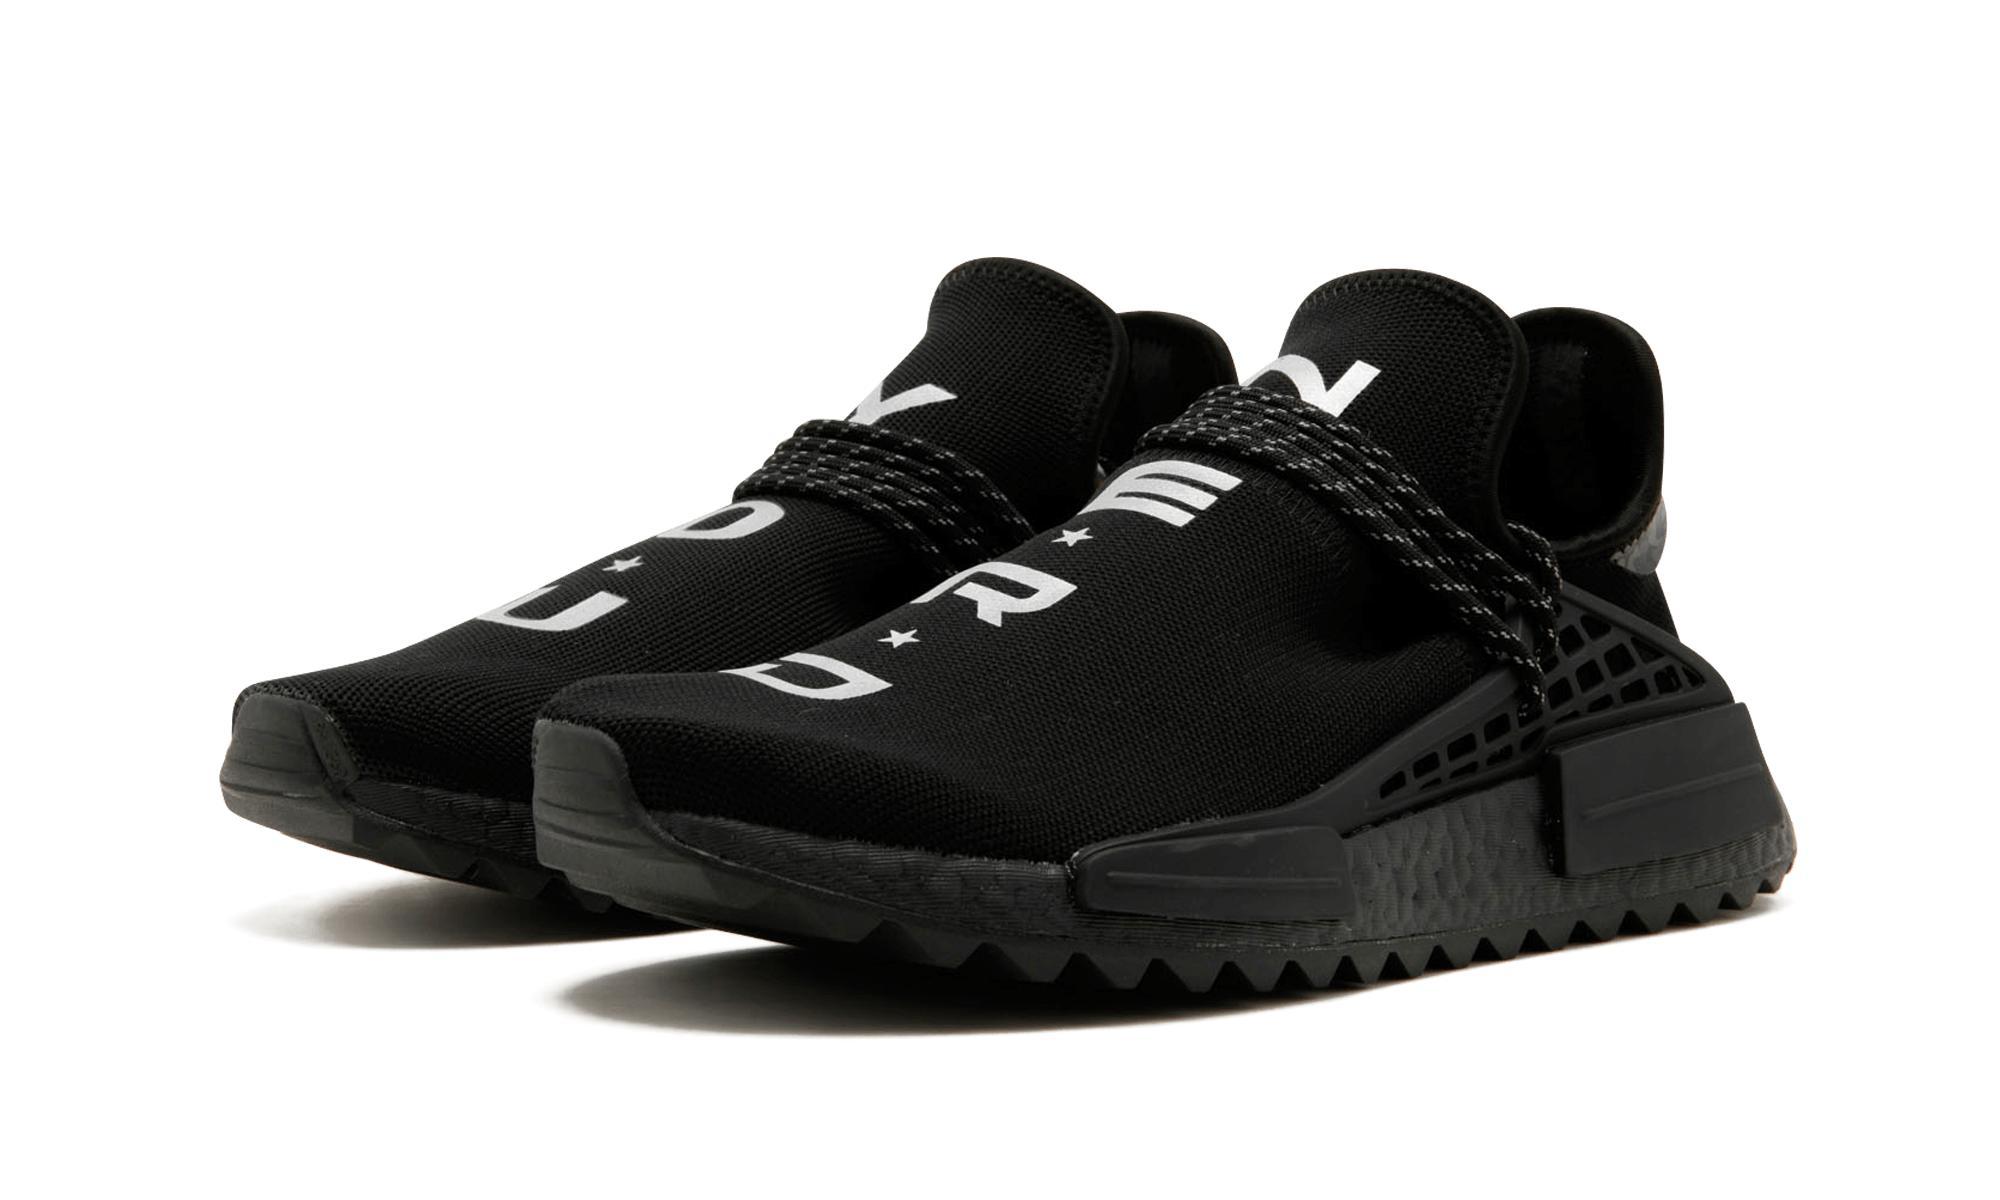 8654742c3e6 Adidas - Black Pharrell Williams Human Race Nmd Tr for Men - Lyst. View  fullscreen